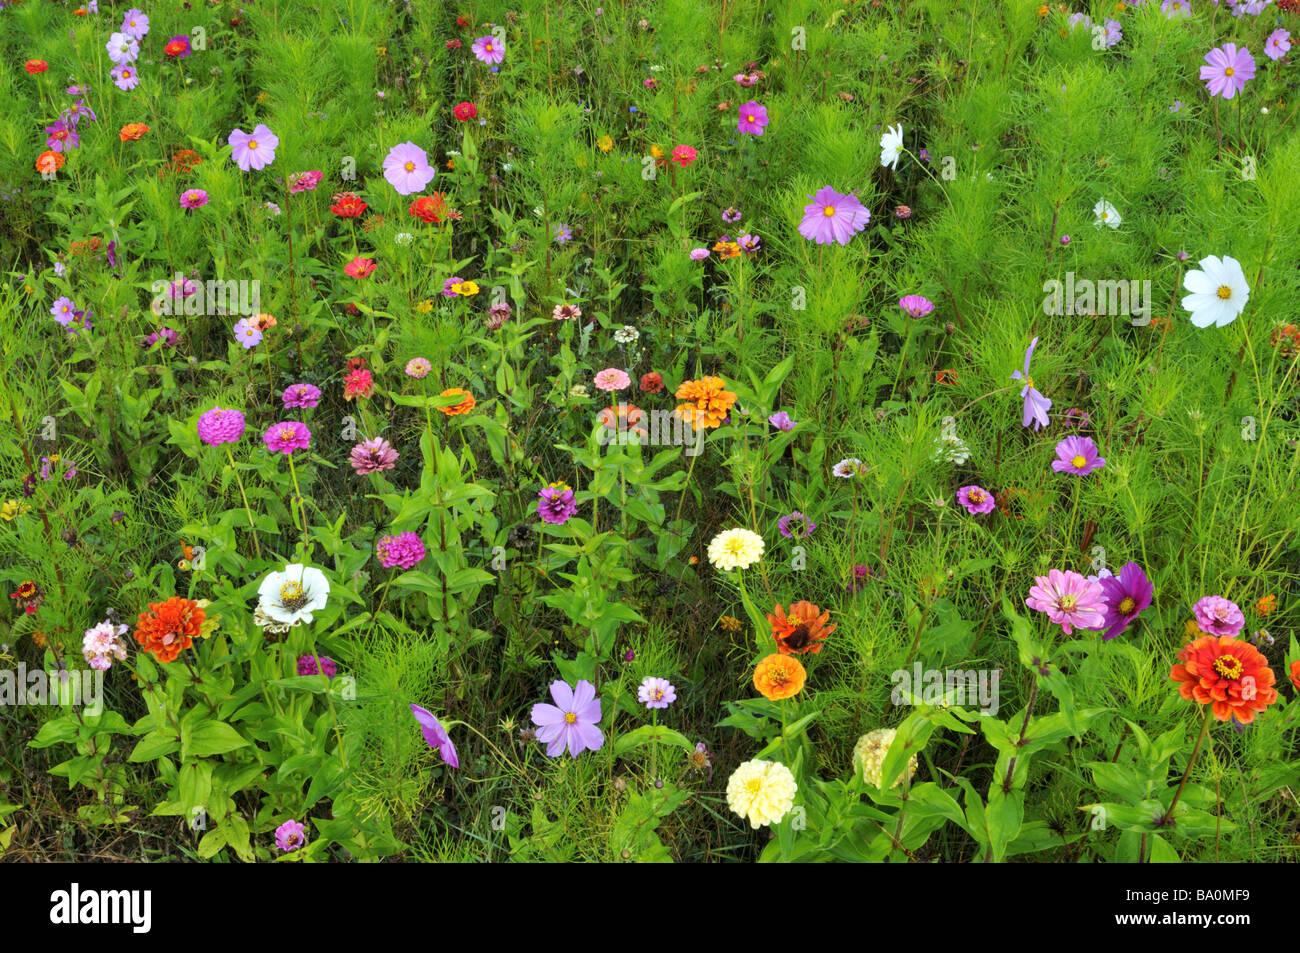 garden in september stockfotos garden in september bilder alamy. Black Bedroom Furniture Sets. Home Design Ideas